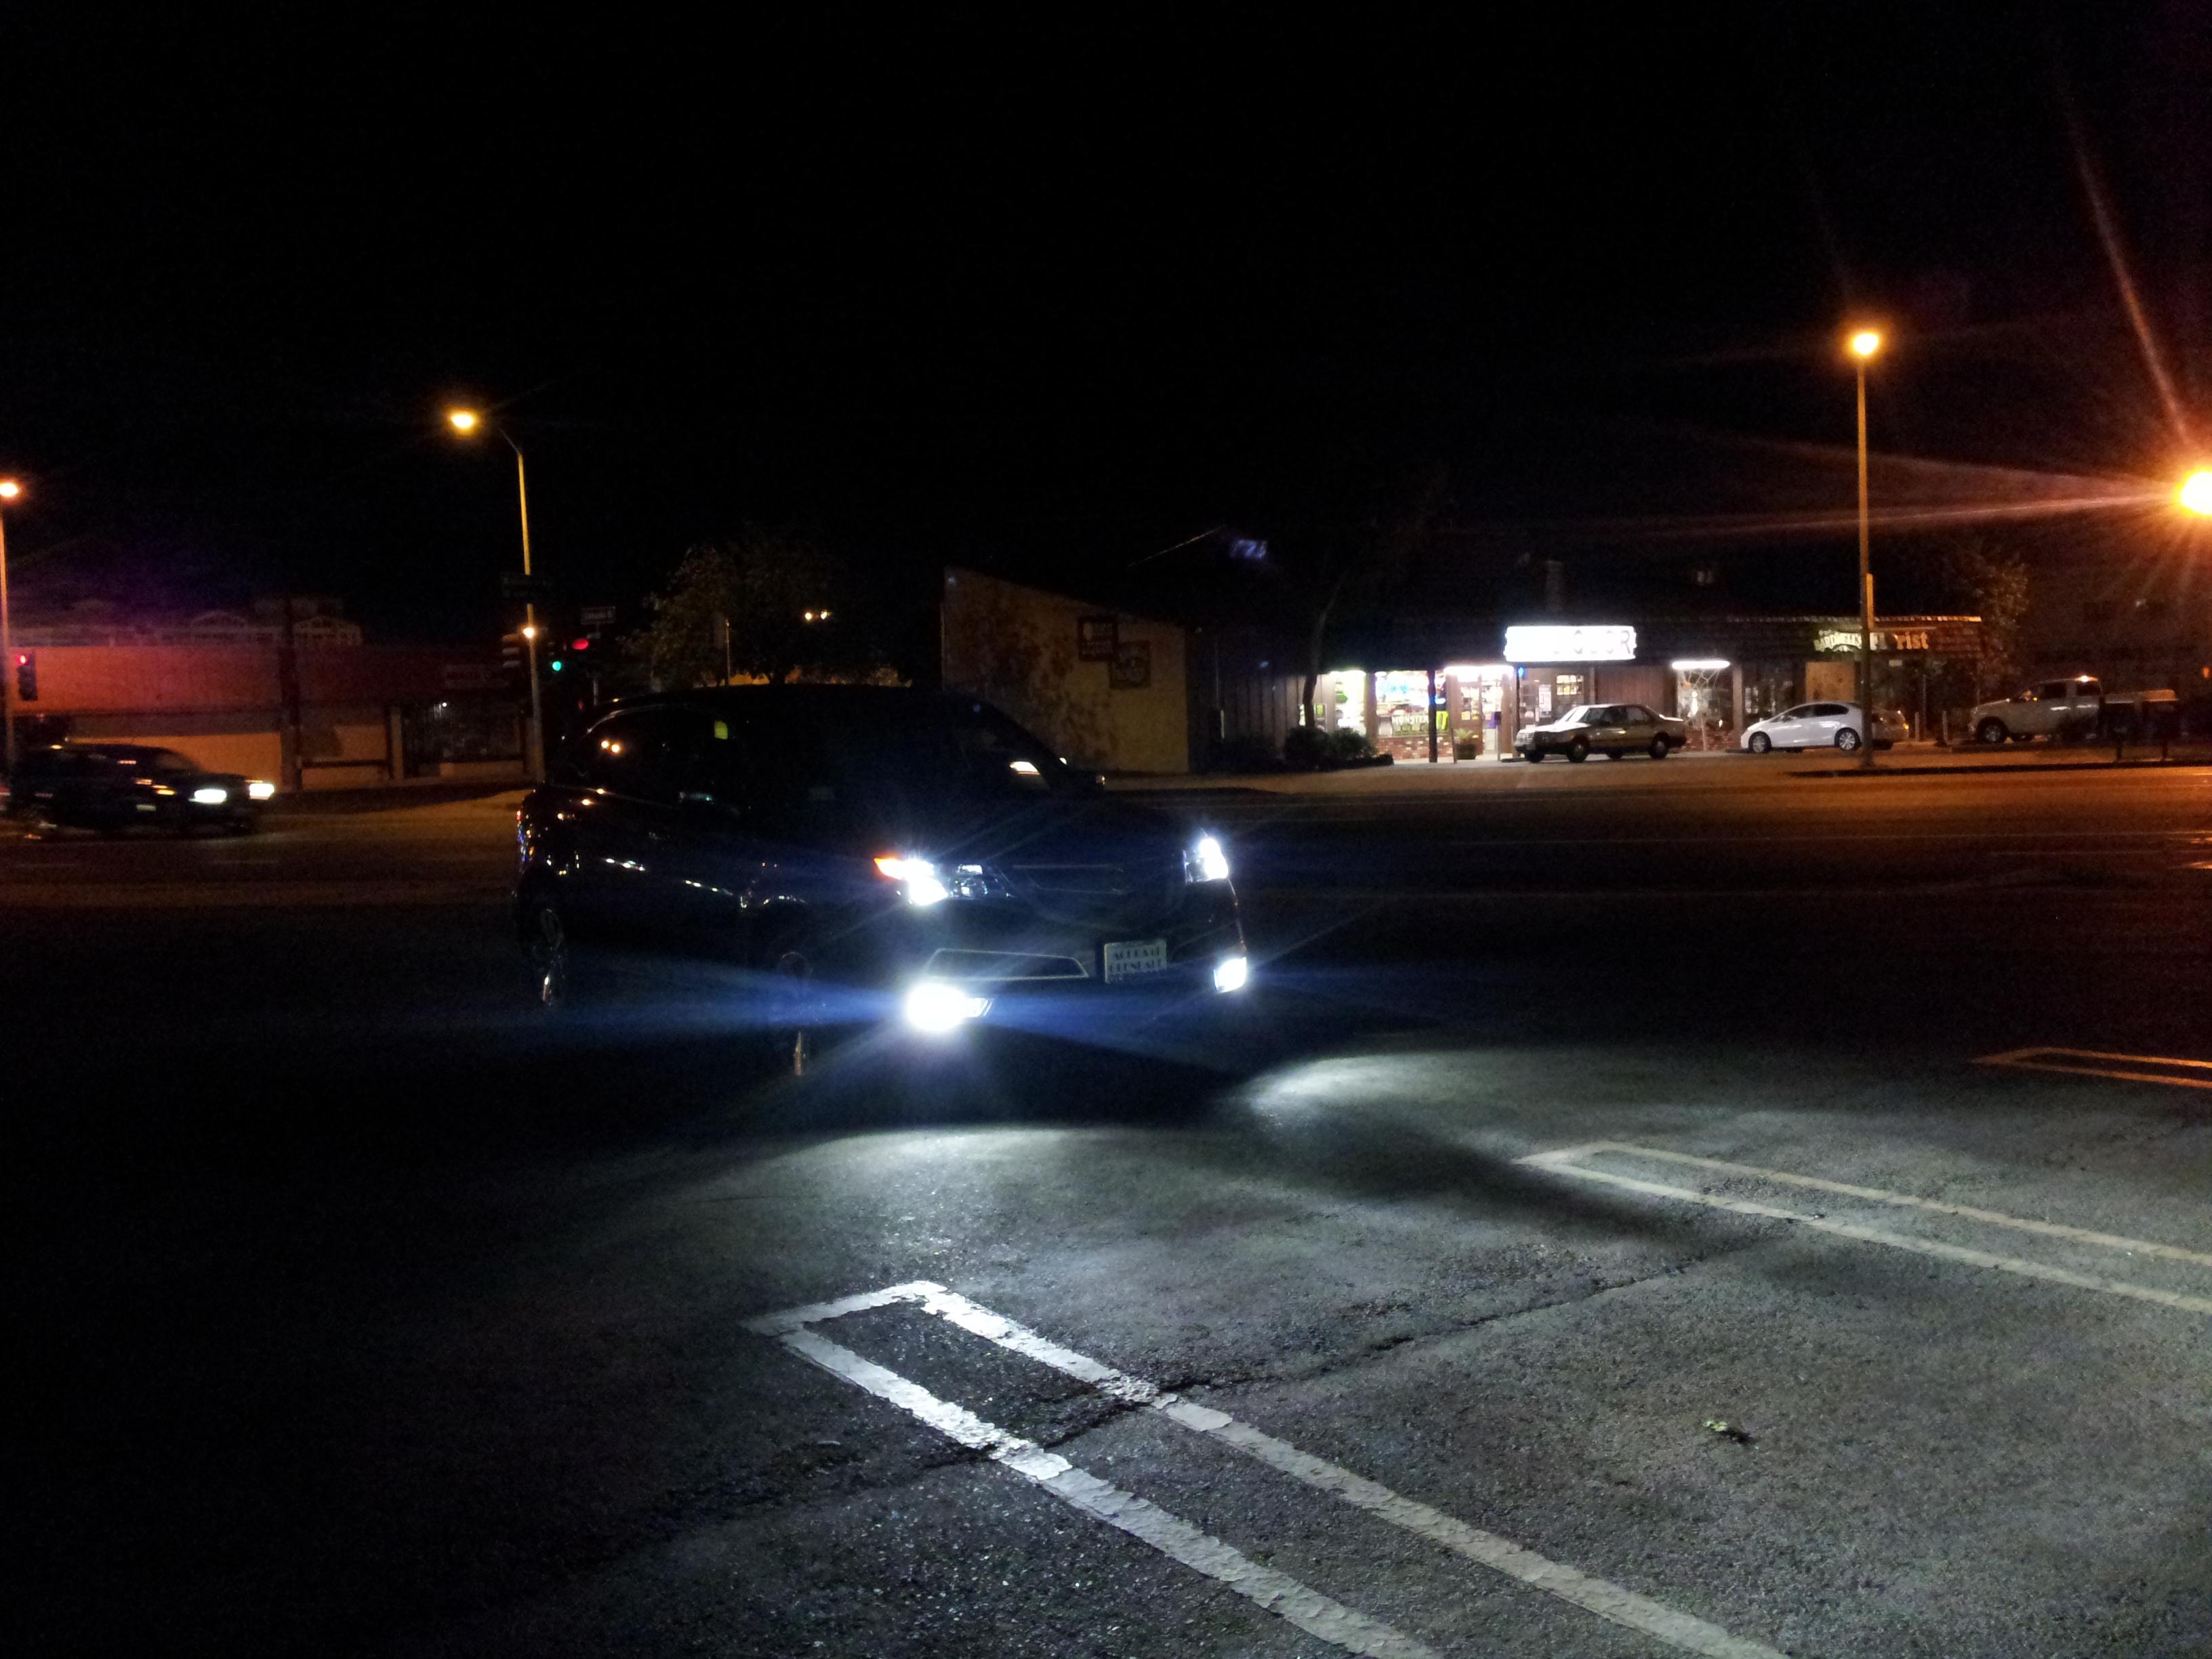 HID Fog/LED DRL Installed - PICS-20121025_214012.jpg